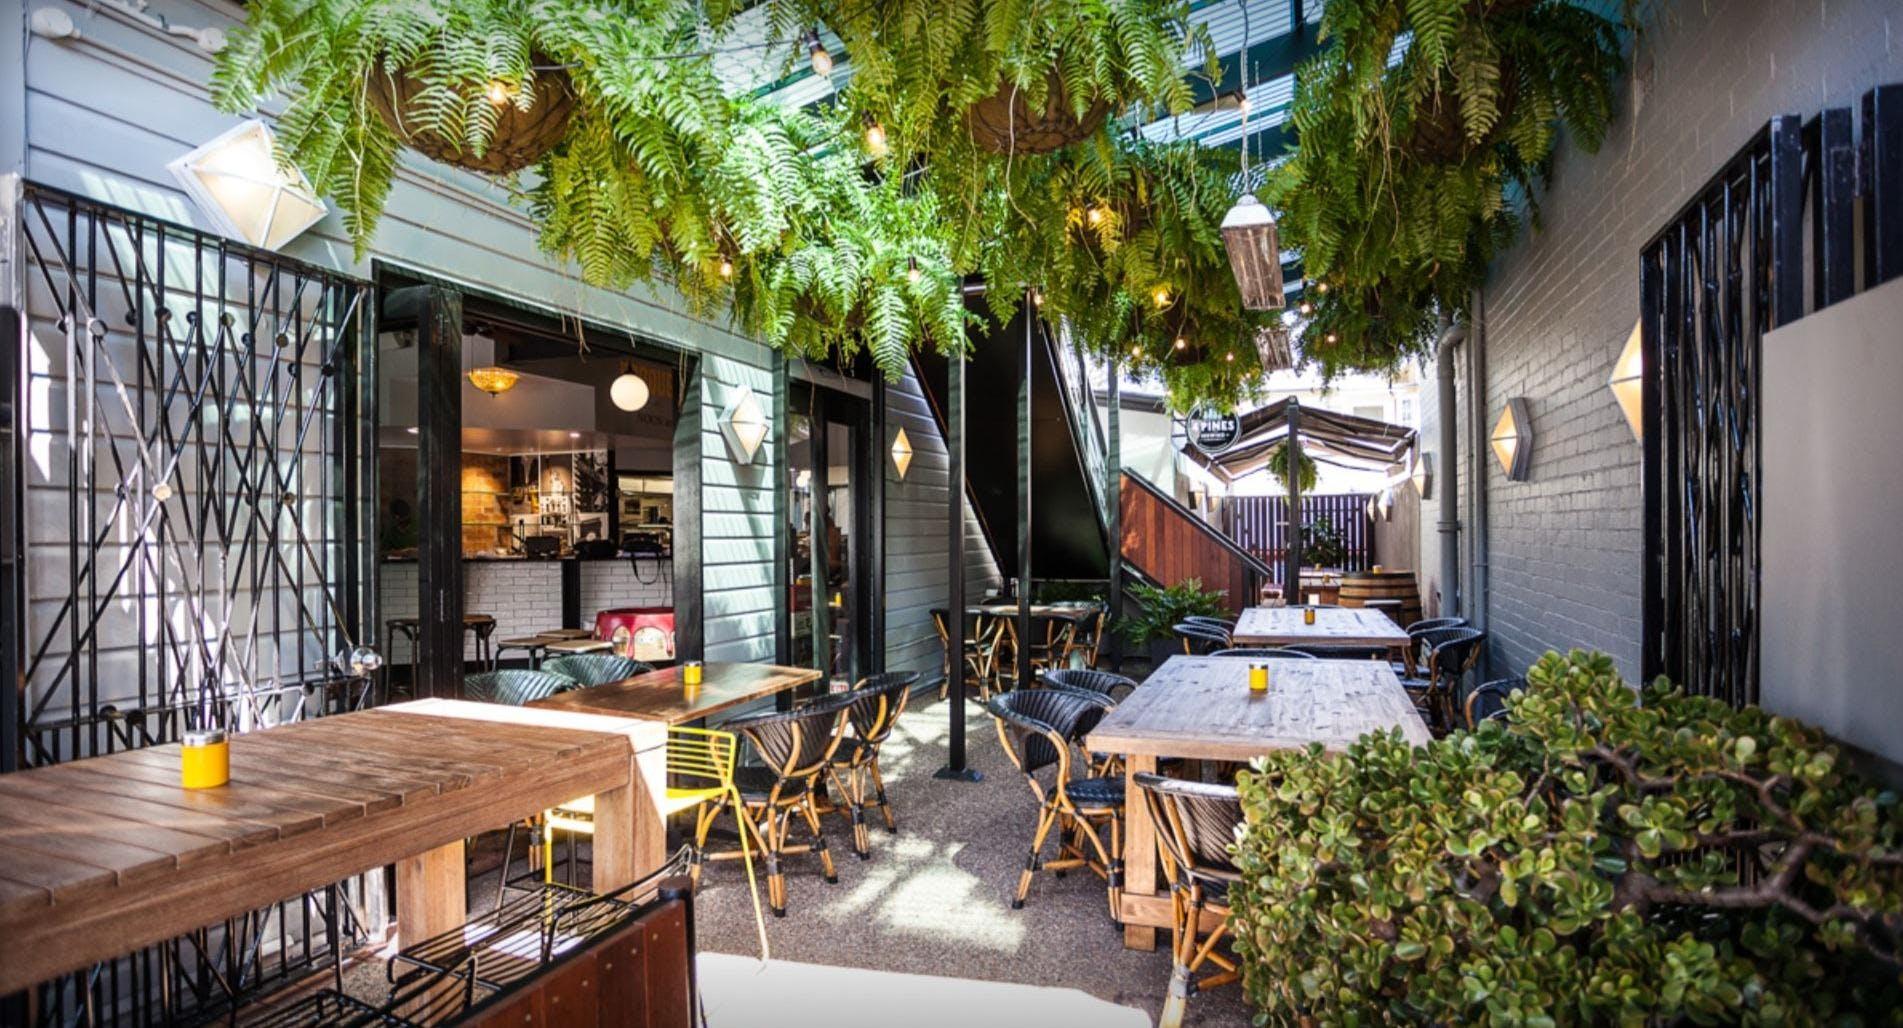 Photo of restaurant Five Boroughs - Ascot in Ascot, Brisbane